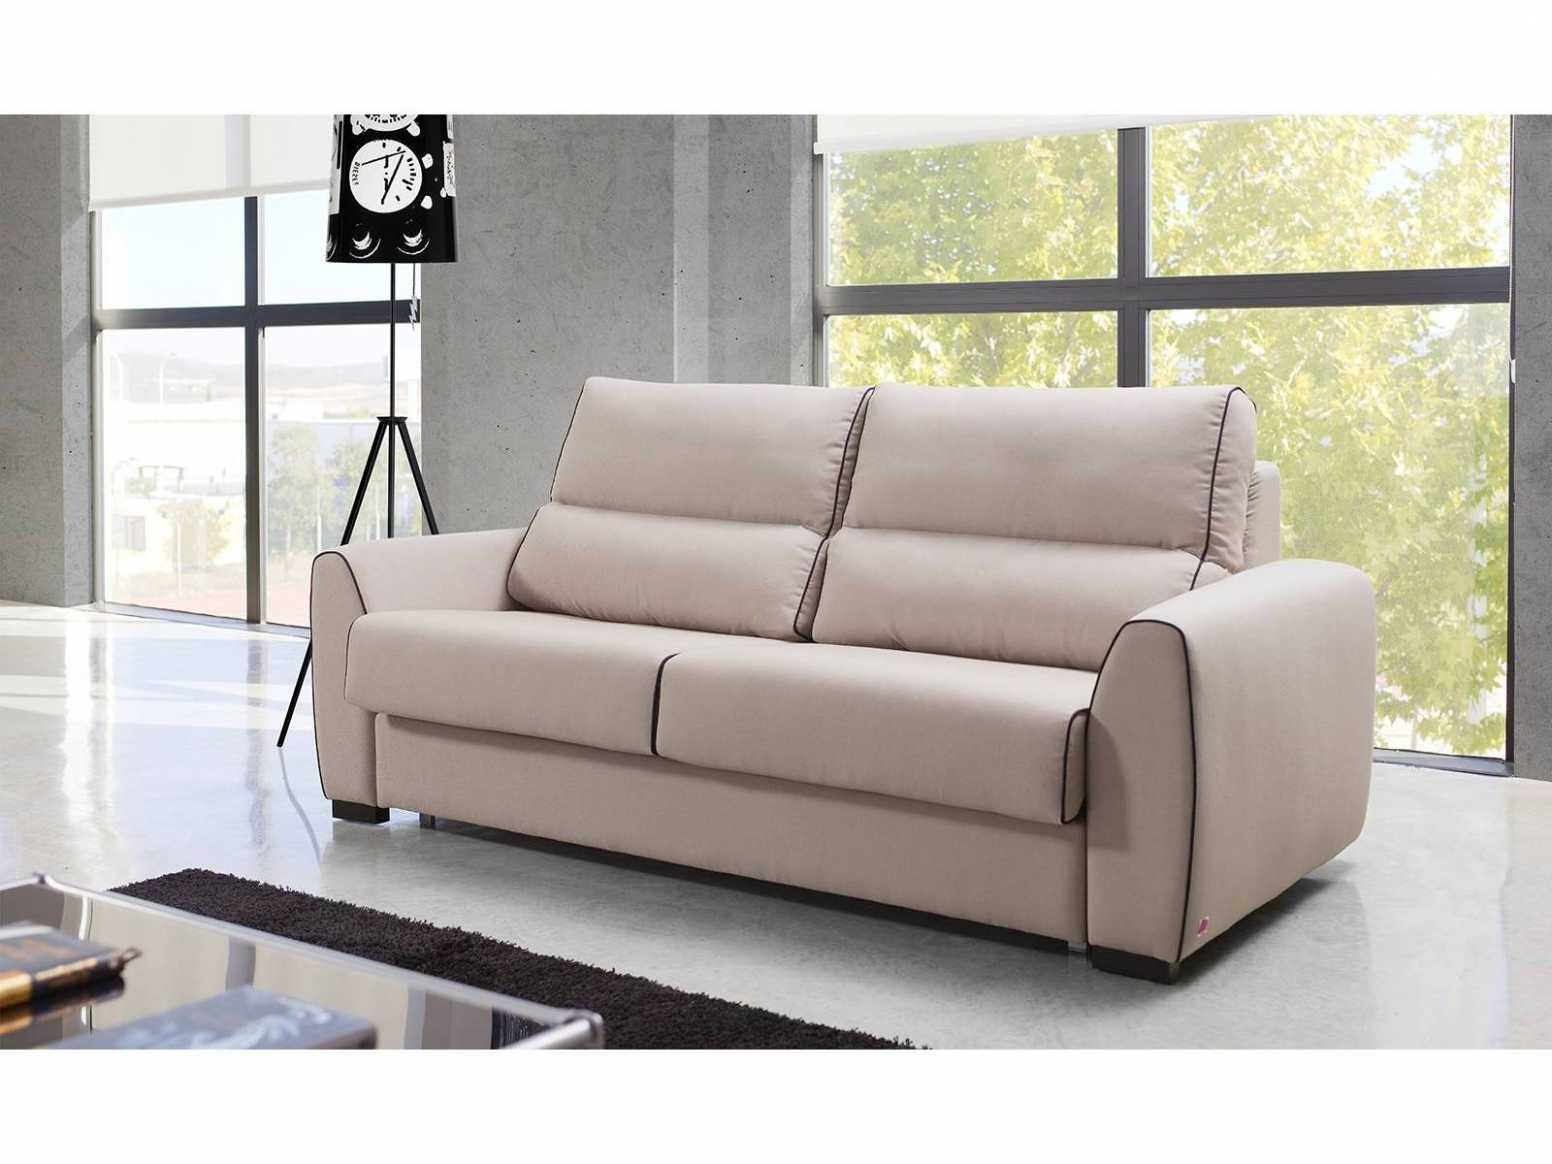 Sofas Muy Baratos E6d5 sofa Cama Corua Elegant sofas Muy Baratos Castellon Segunda Mano